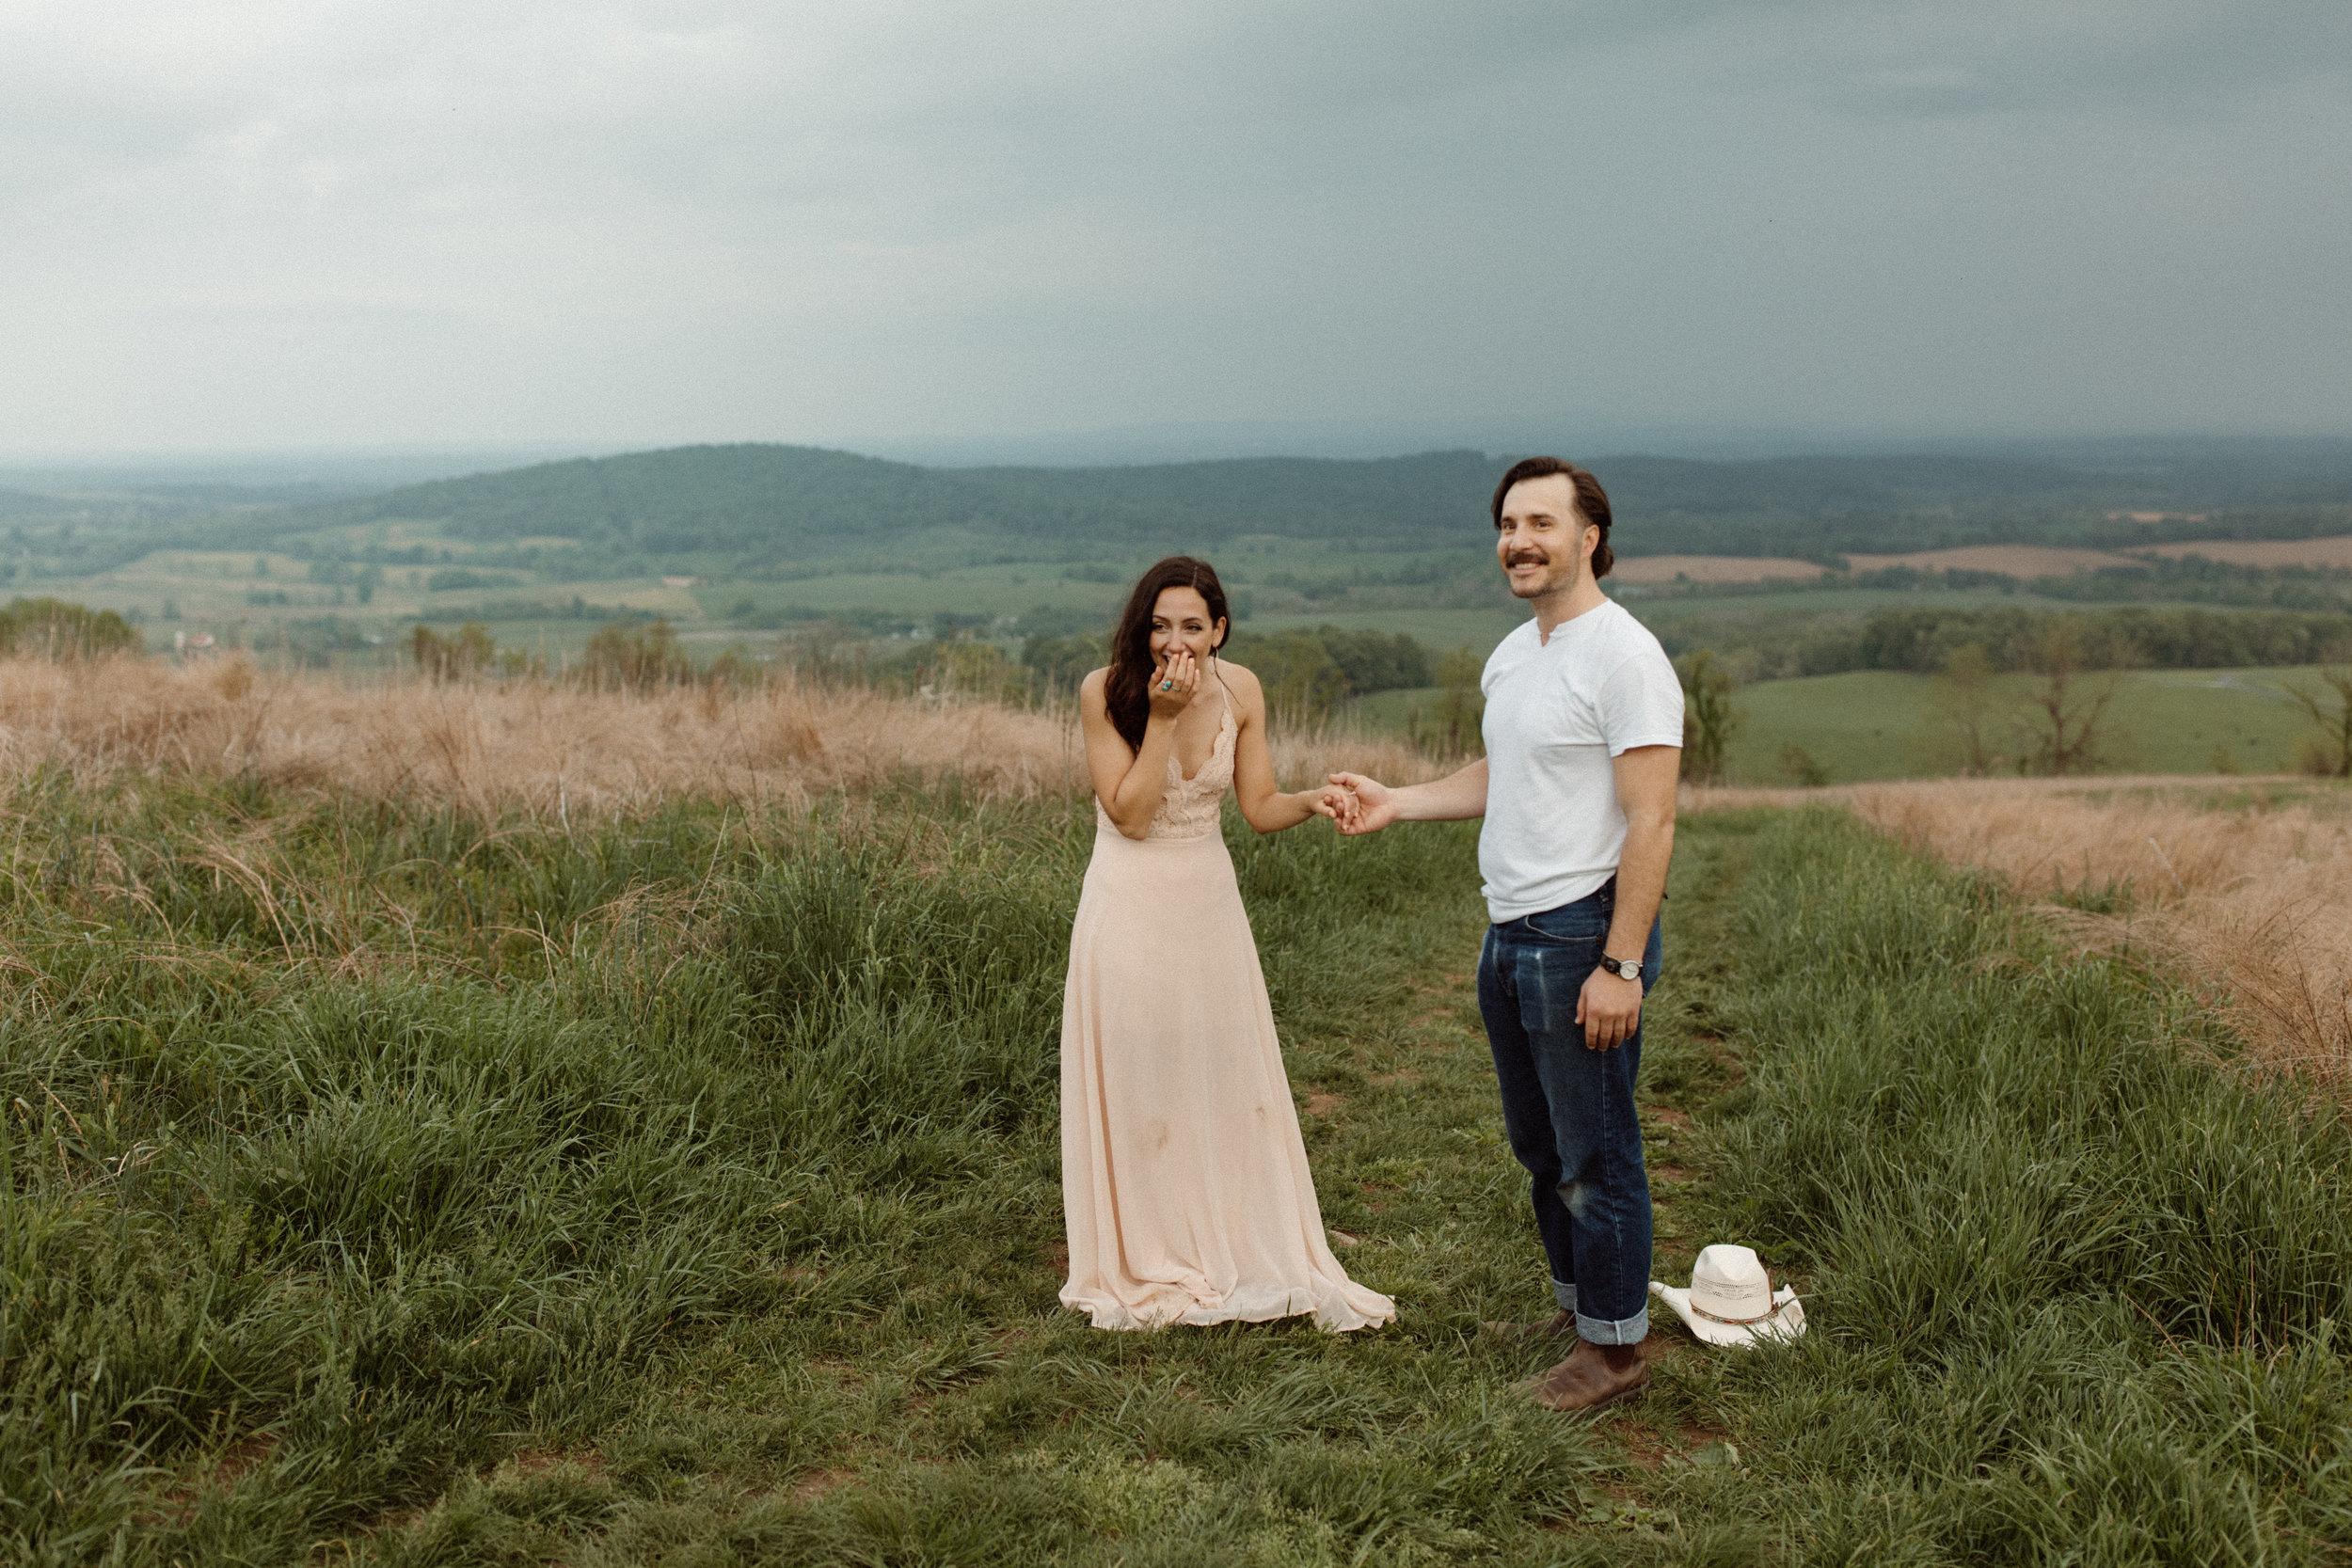 kelsey&mark-engagement-skymeadows-2019-peytoncurry-9875.jpg